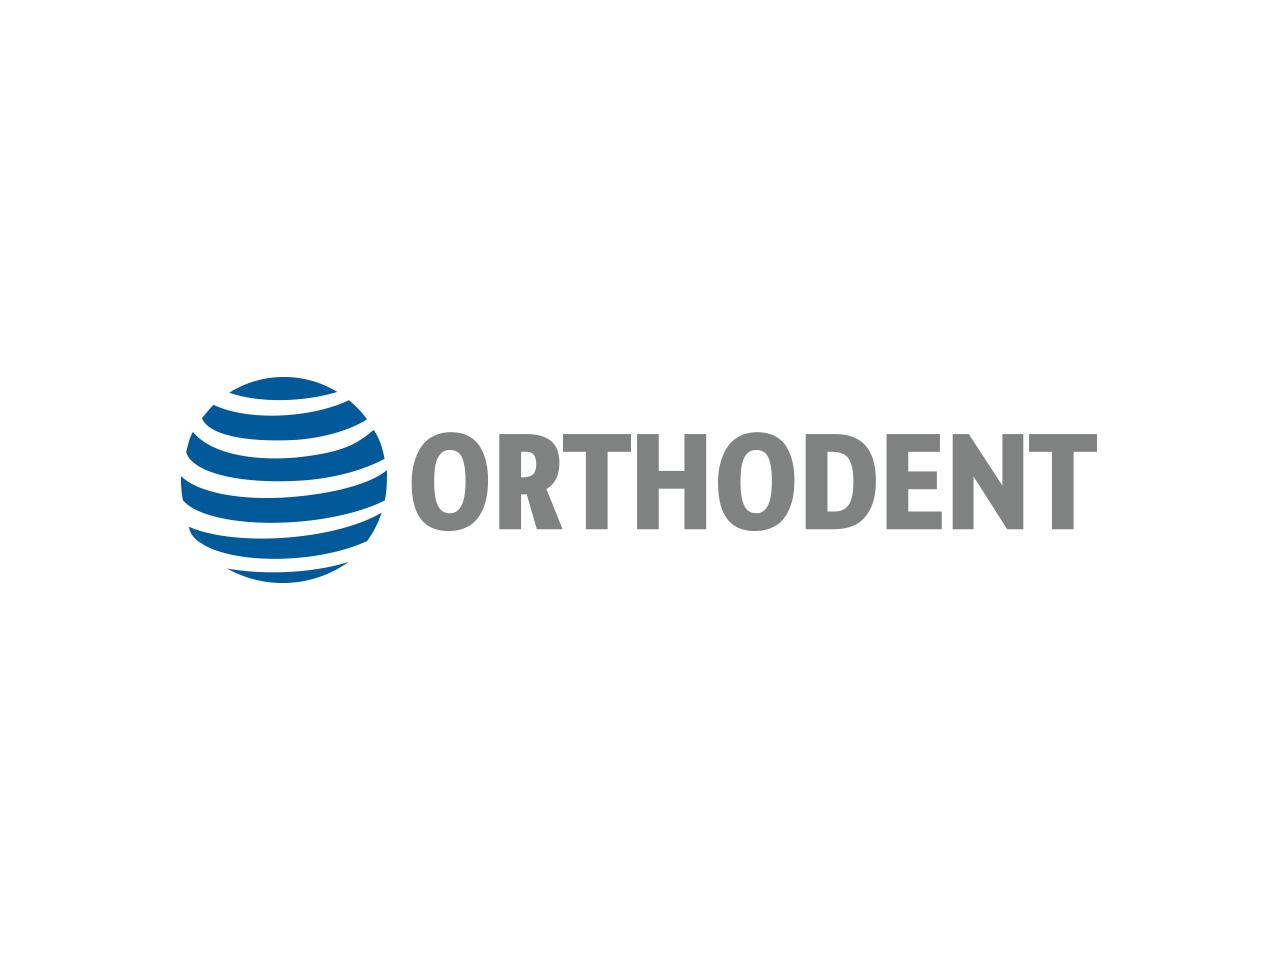 orthodent-discilik-malzemeleri-logo-tasarim-1